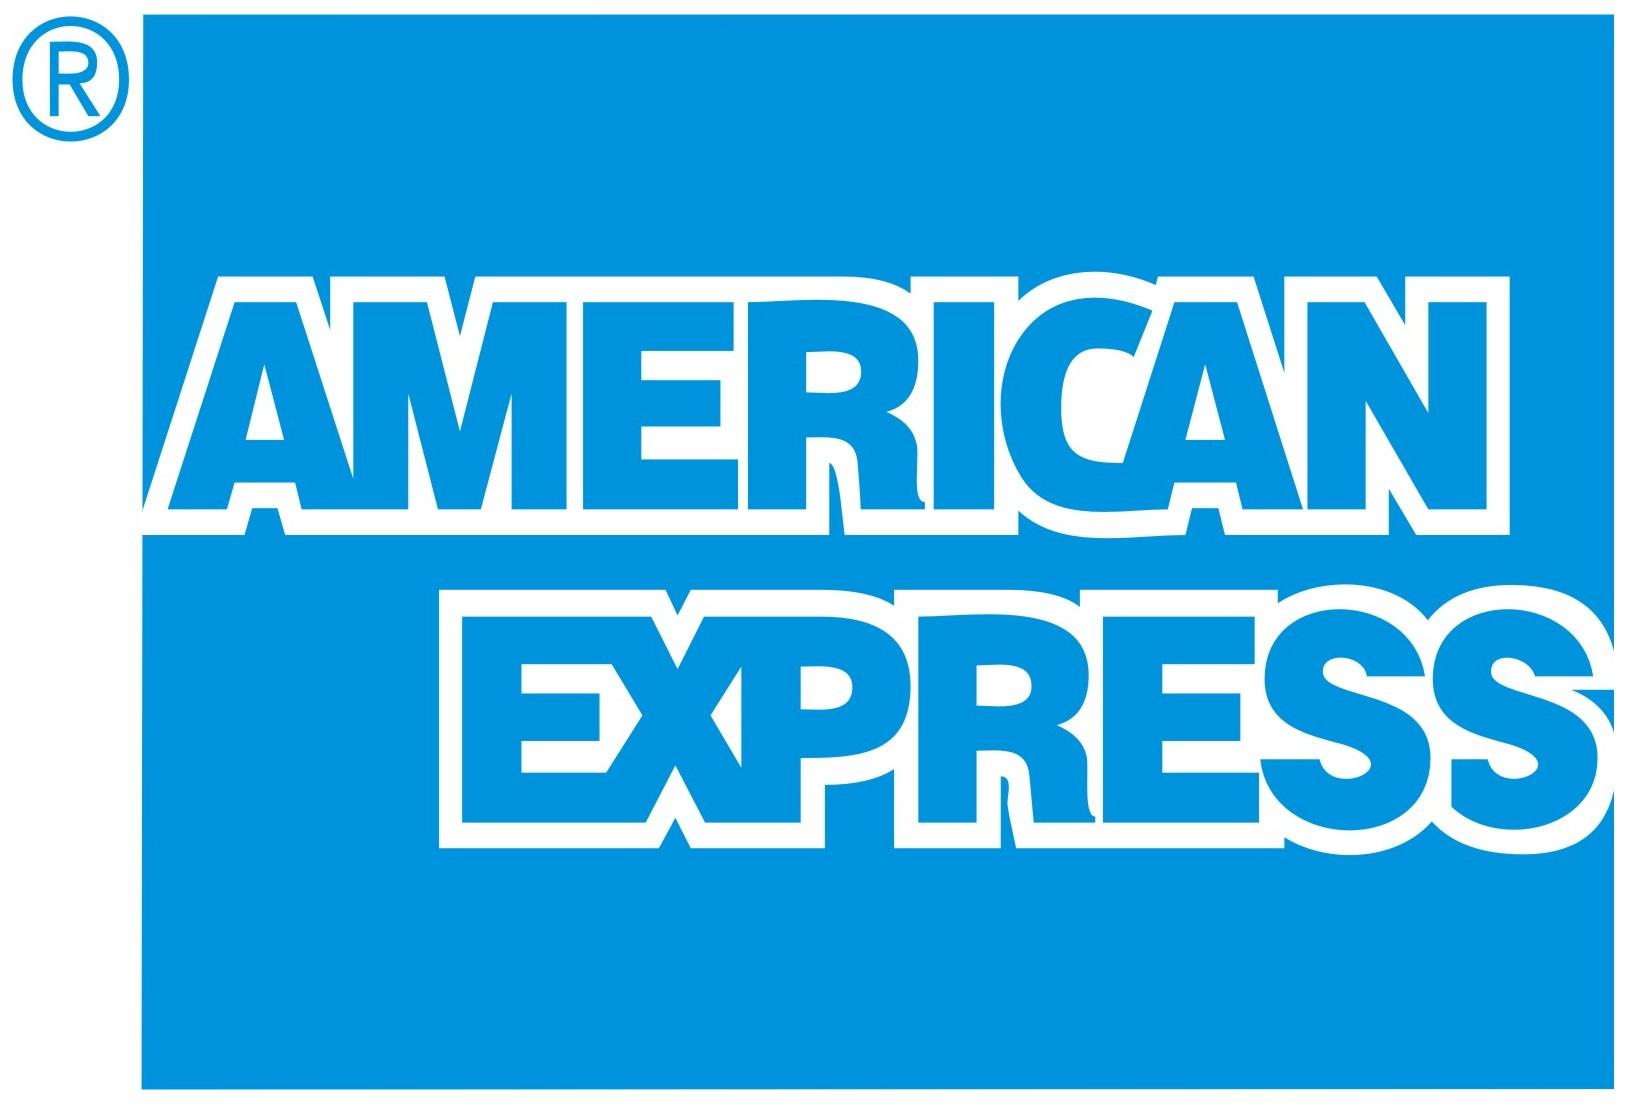 american express logo wallpaper CDI Home Inspections 1630x1106